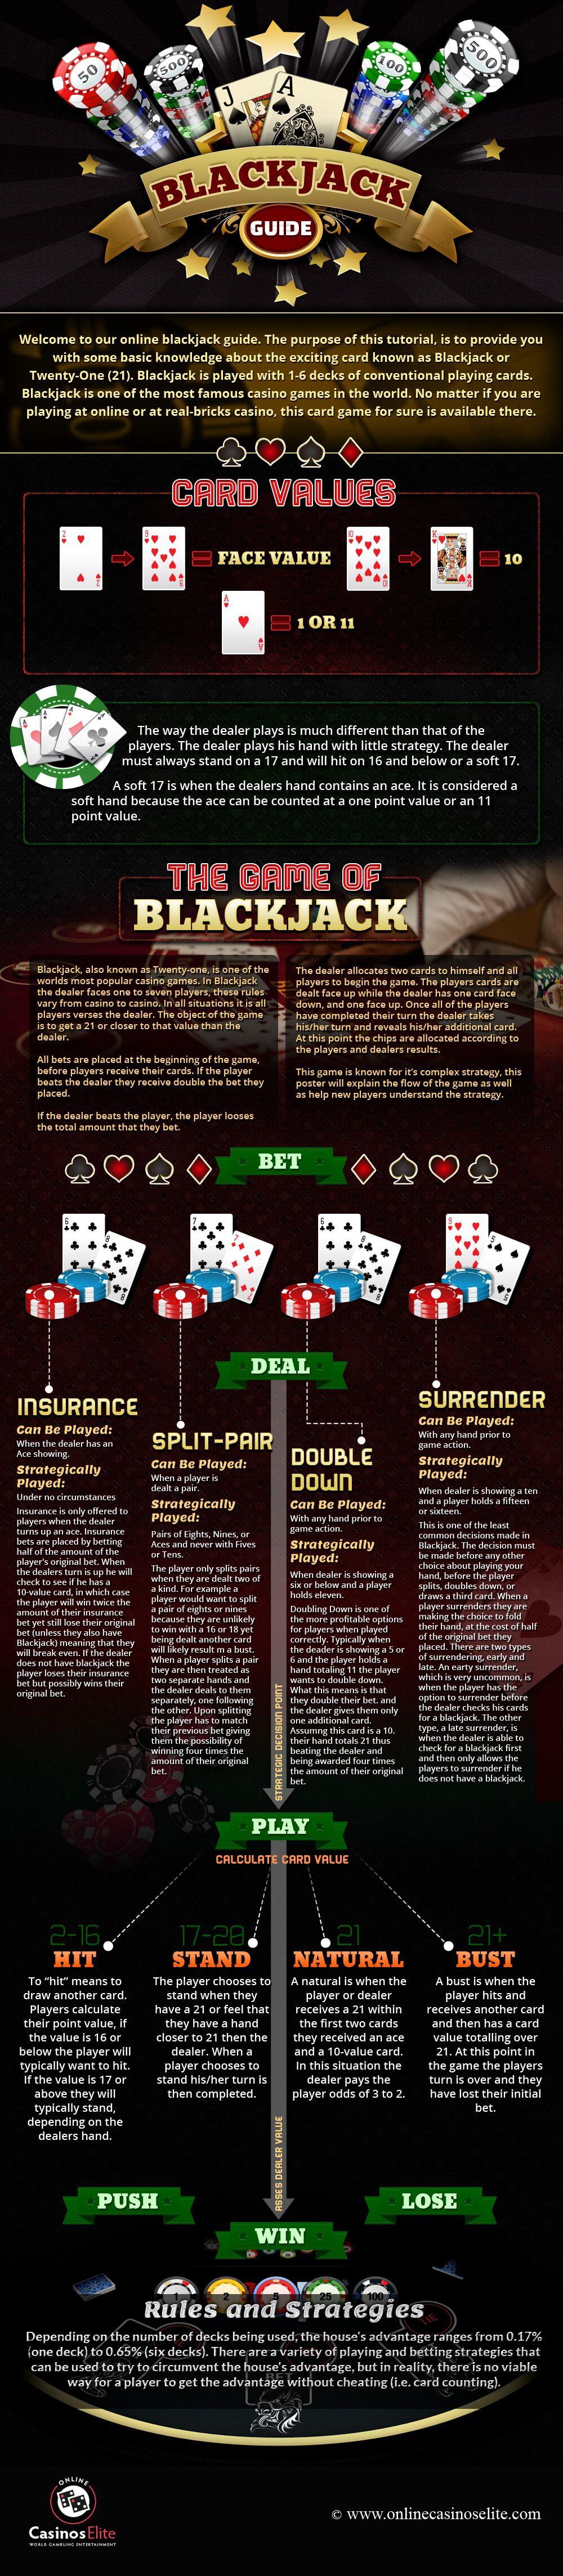 Online Blackjack Guide Infographic Blackjack Infographic Poker